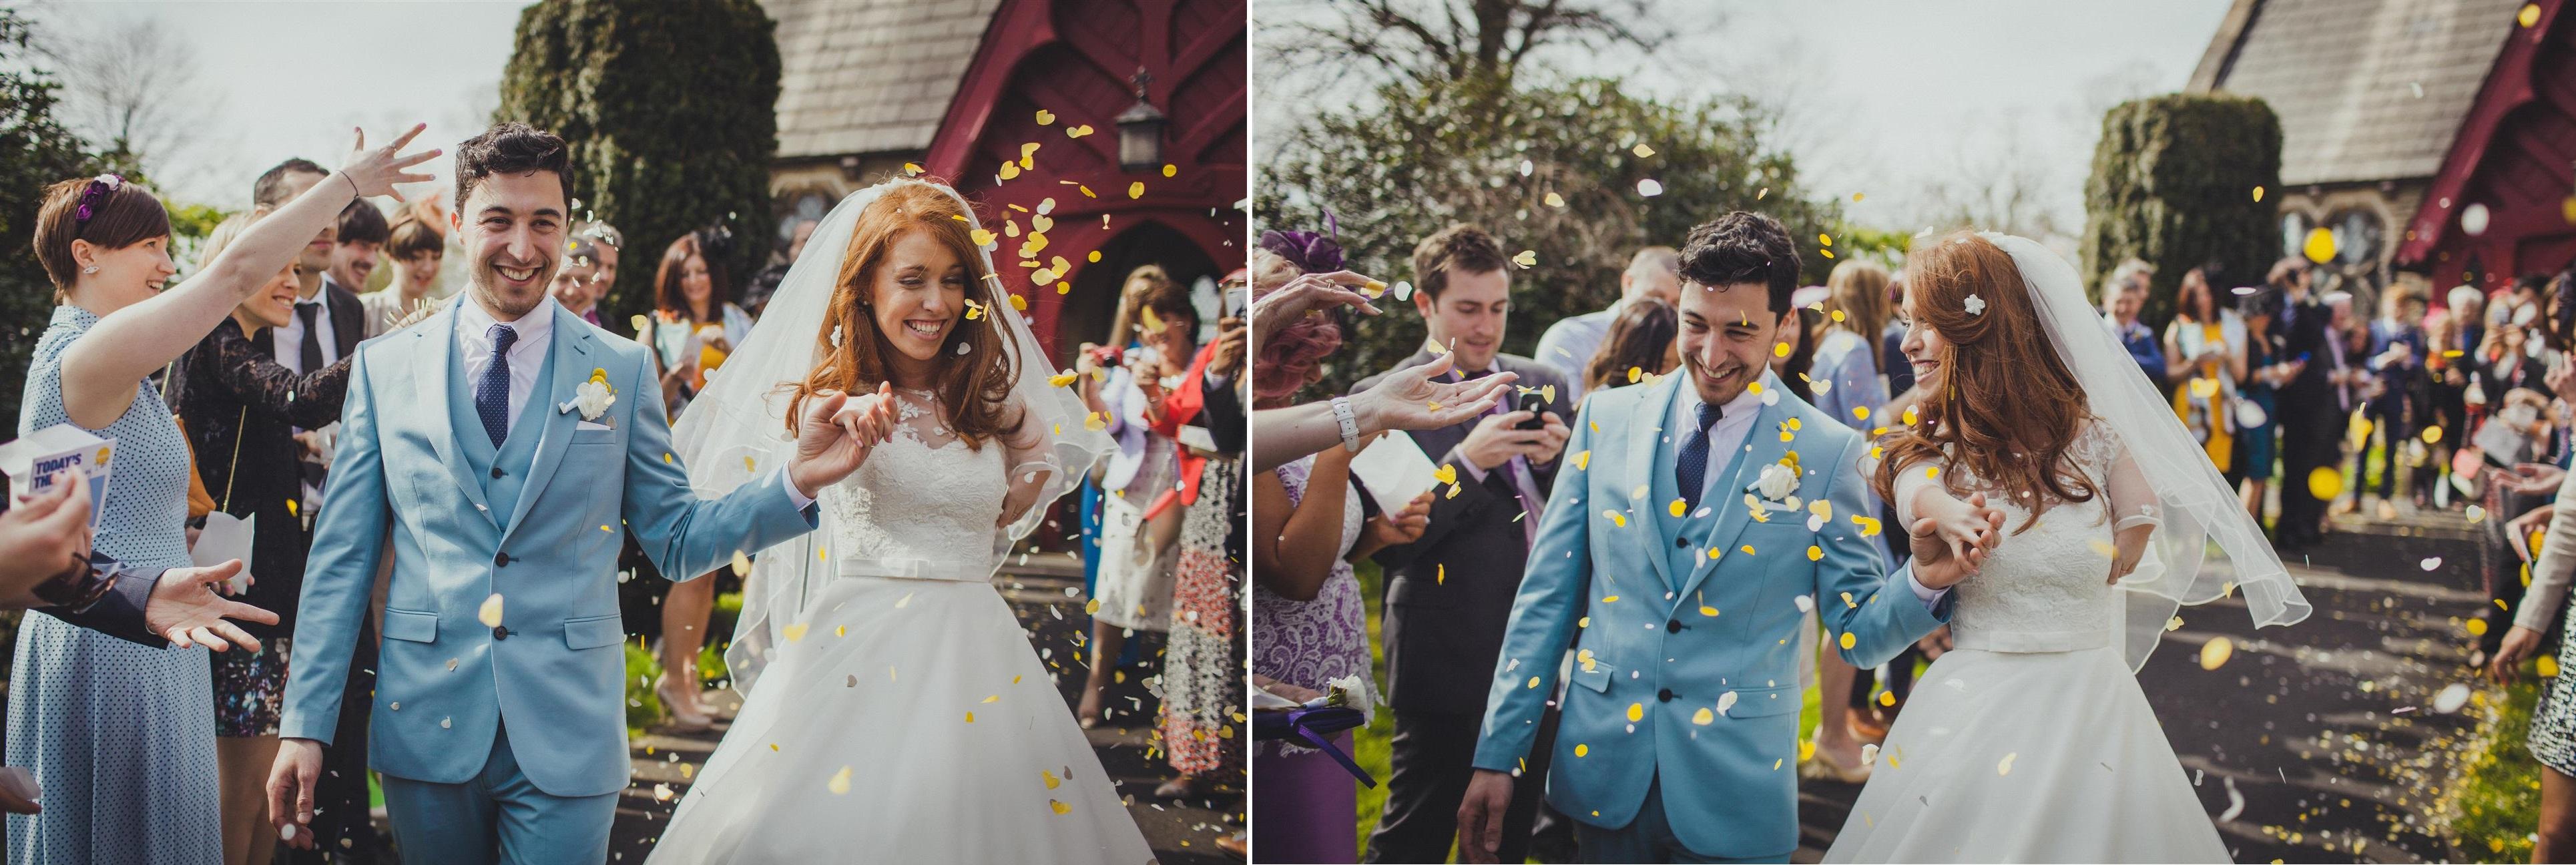 Church Wedding - A Spring 1960s Inspired Wedding